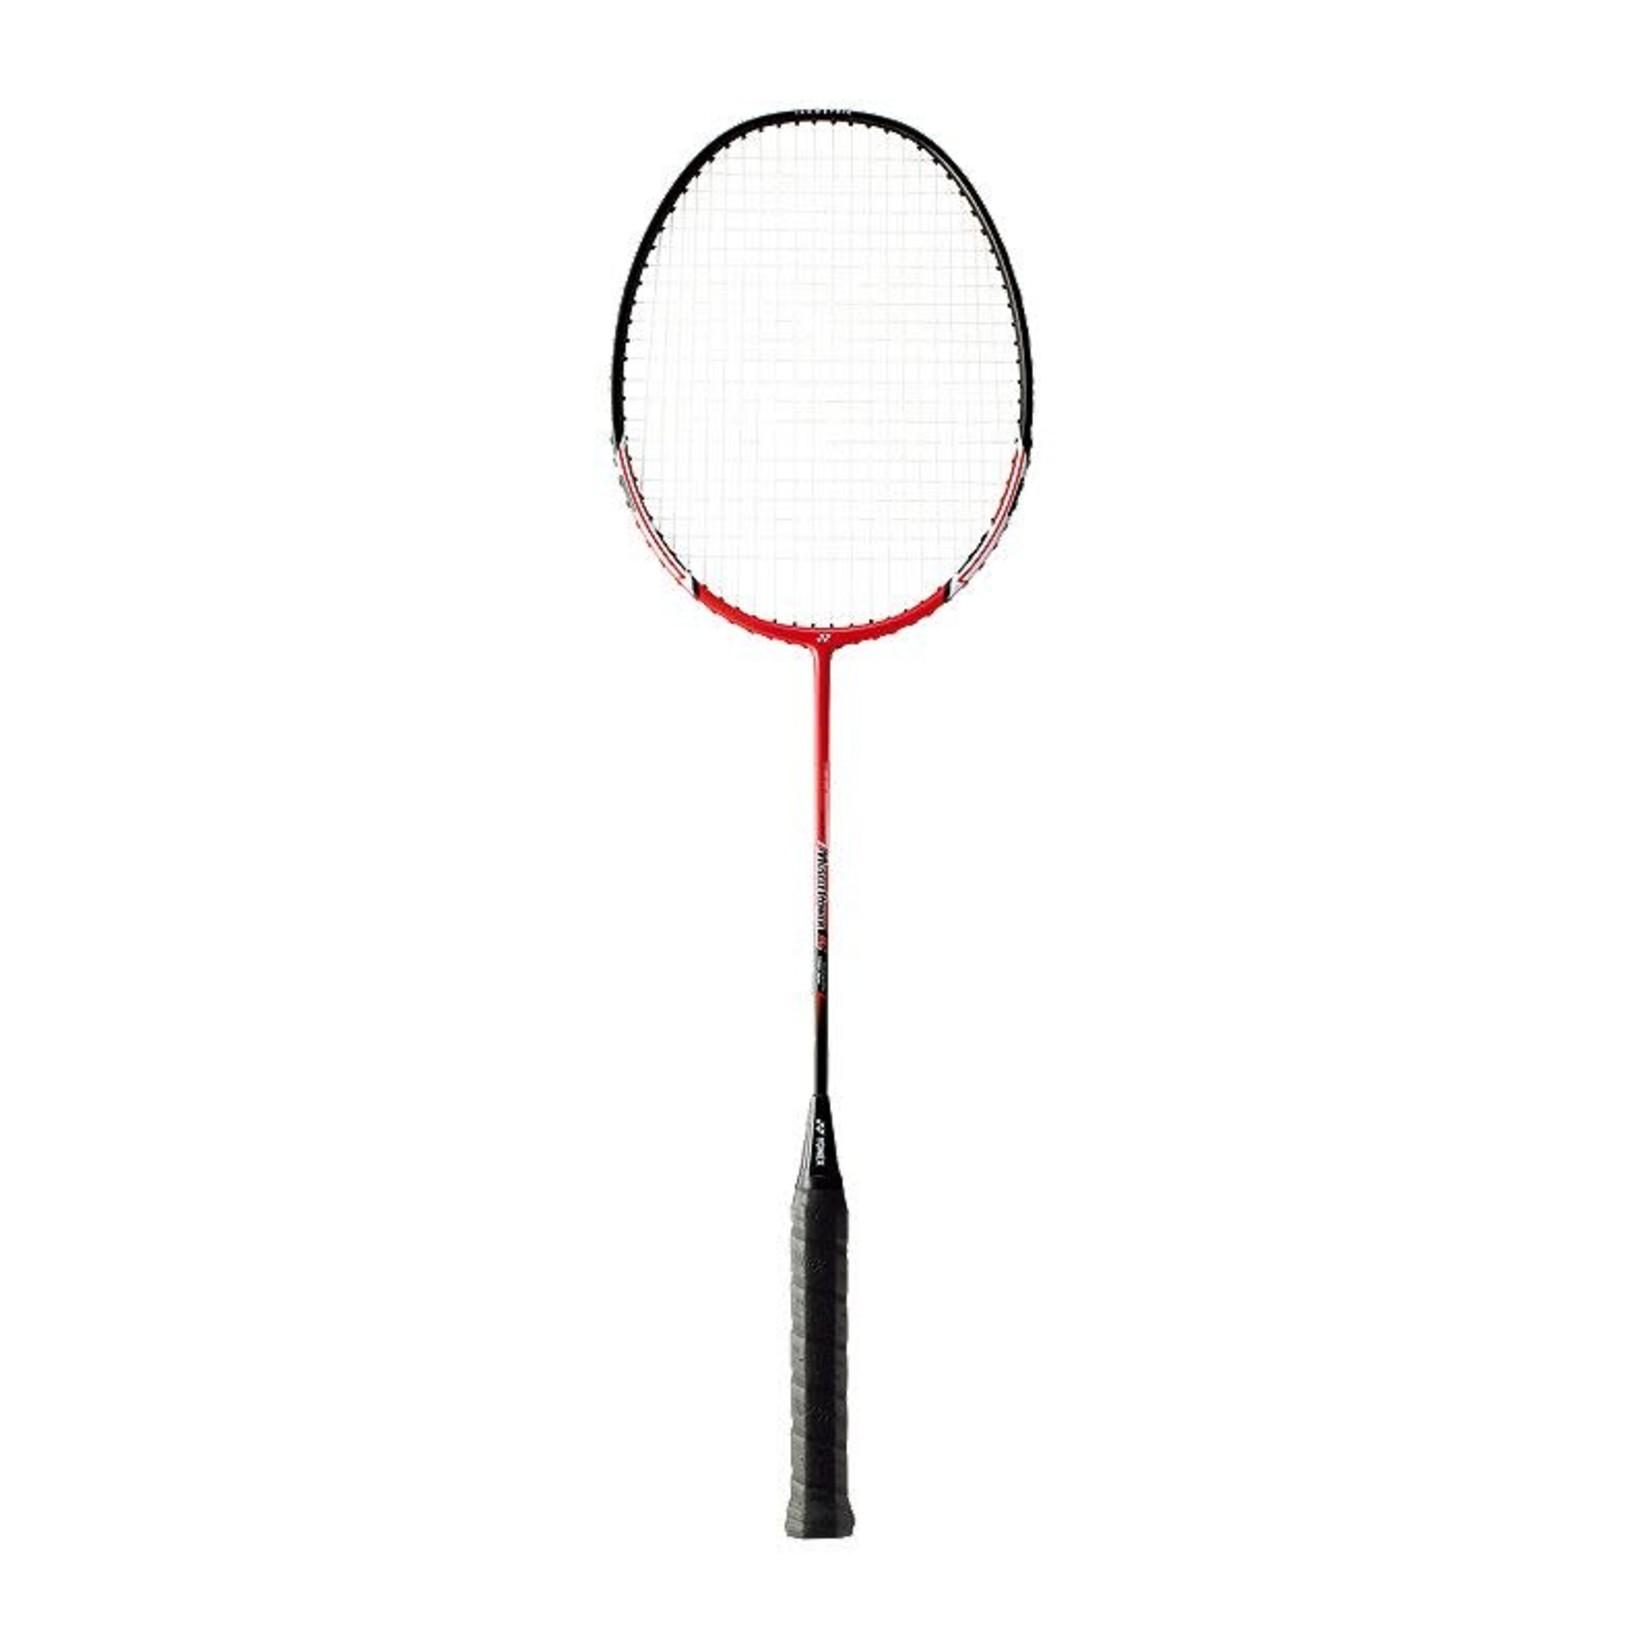 Yonex Yonex Badminton Racquet, Muscle Power 5, Red